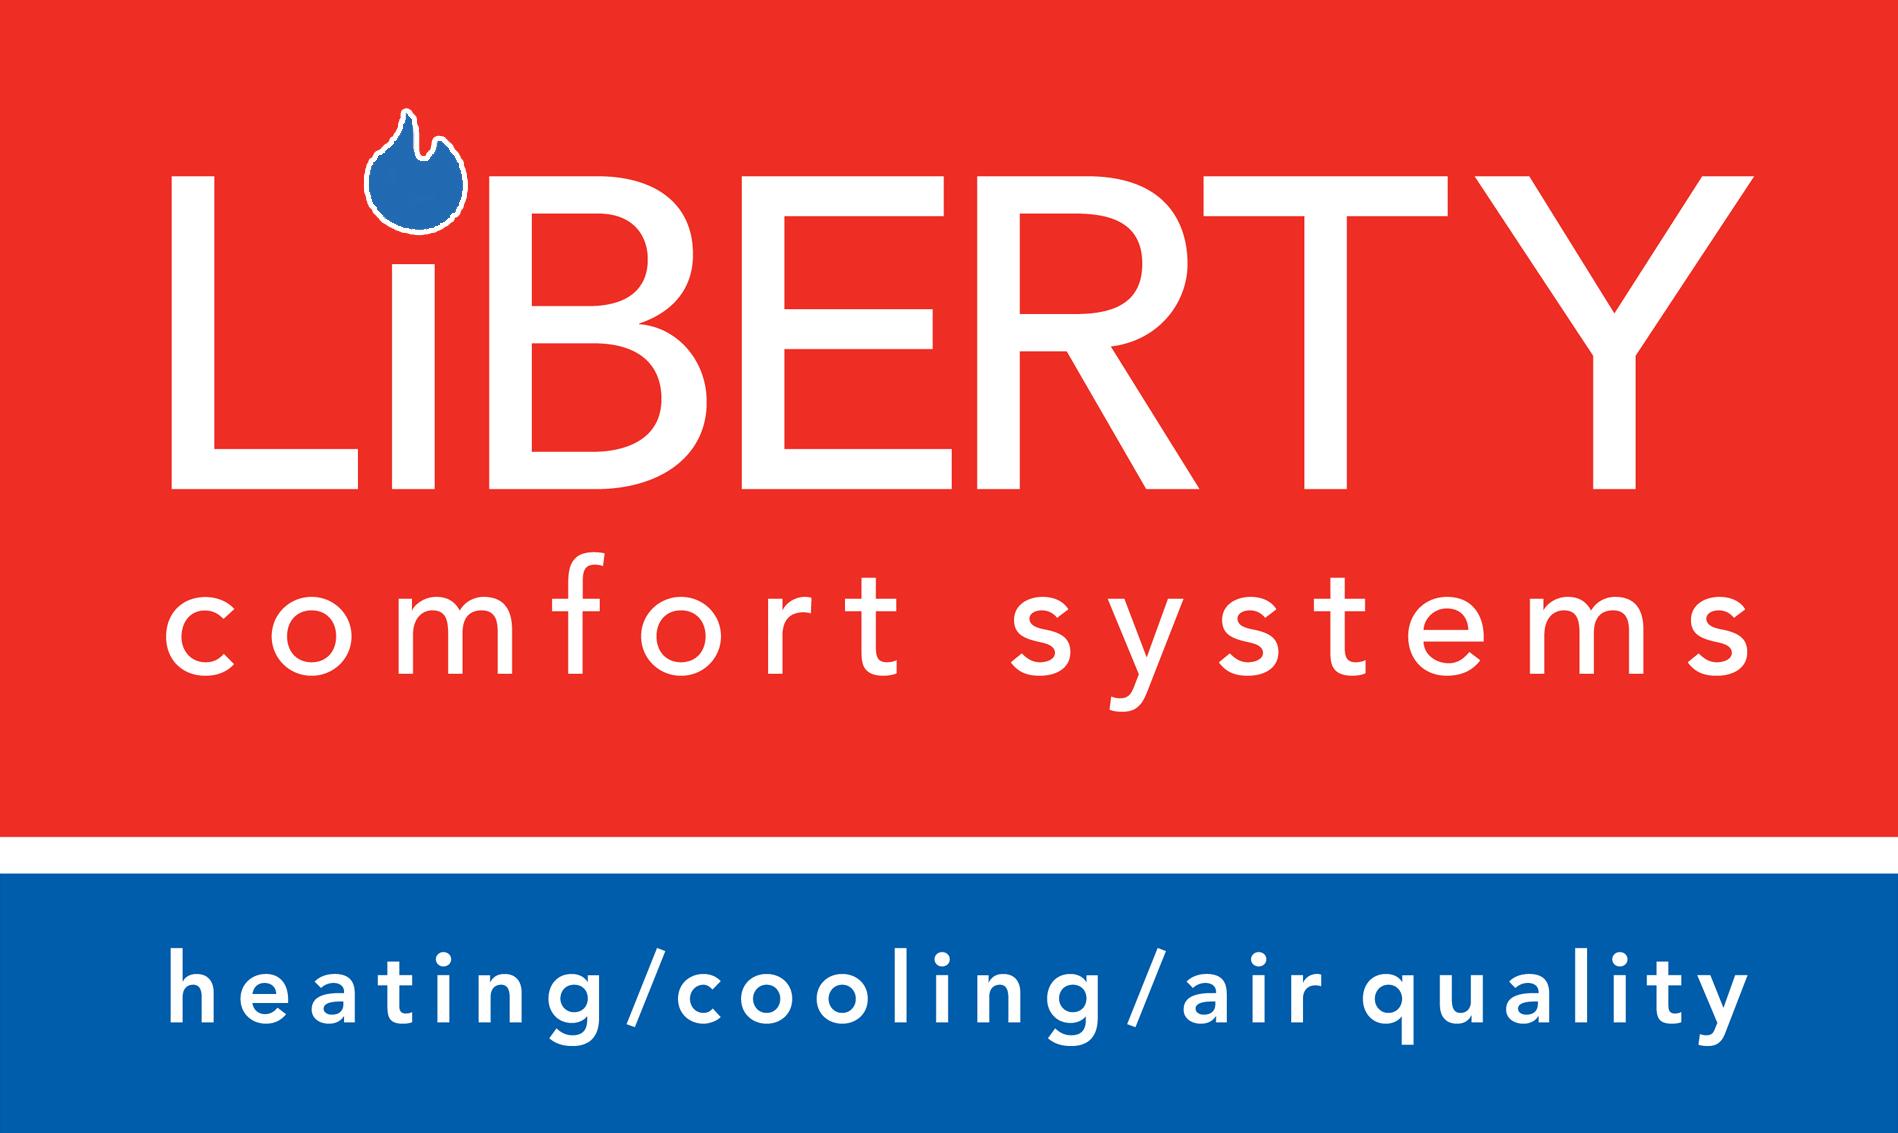 LIBERTY COMFORT SYSTEMS logo